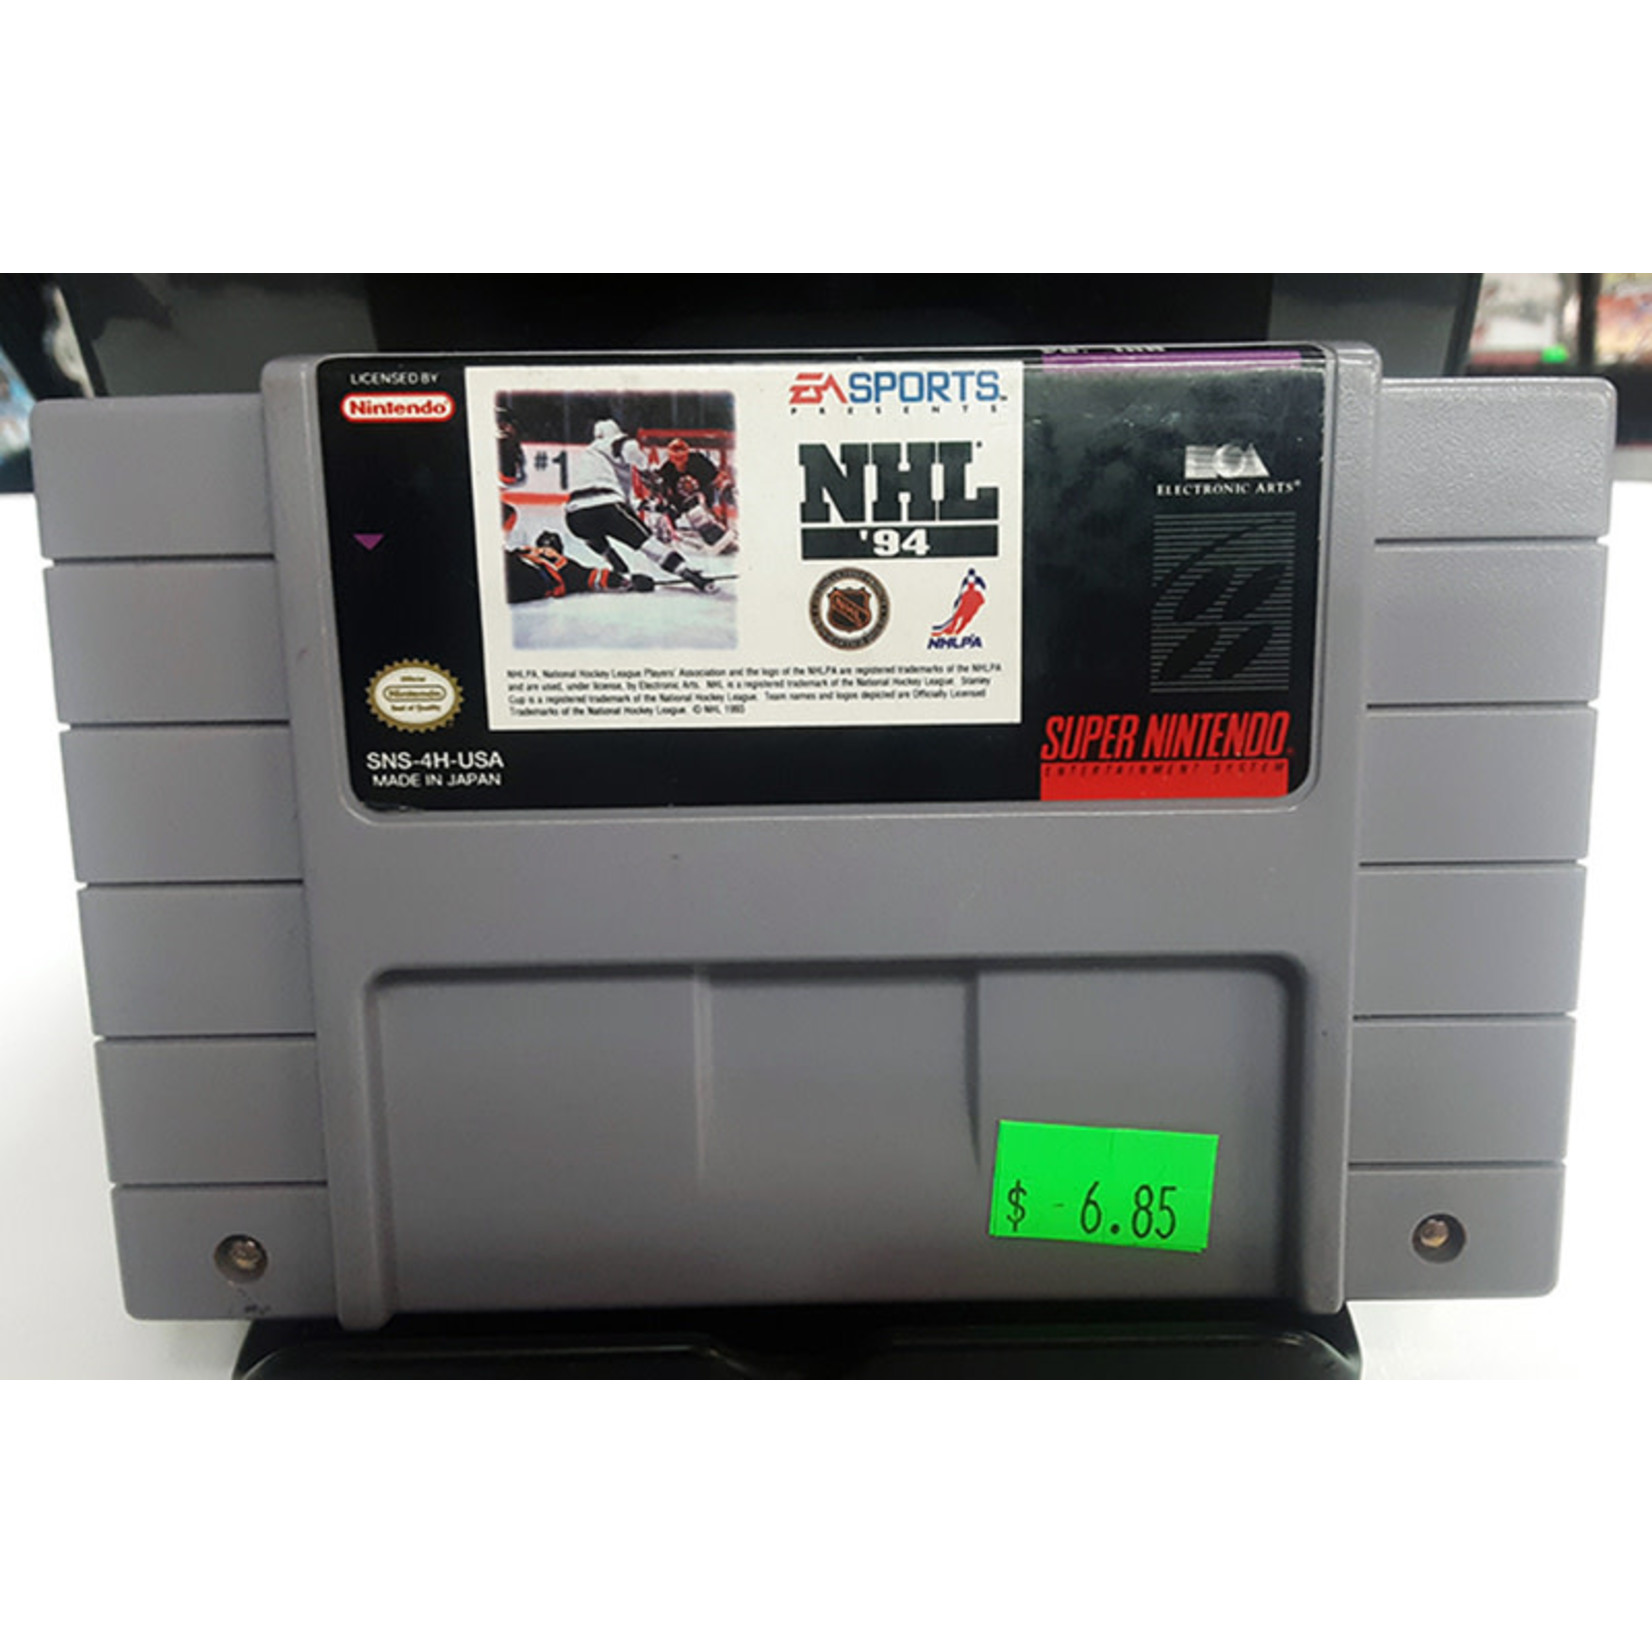 SNESu-NHL '94 (cartridge)